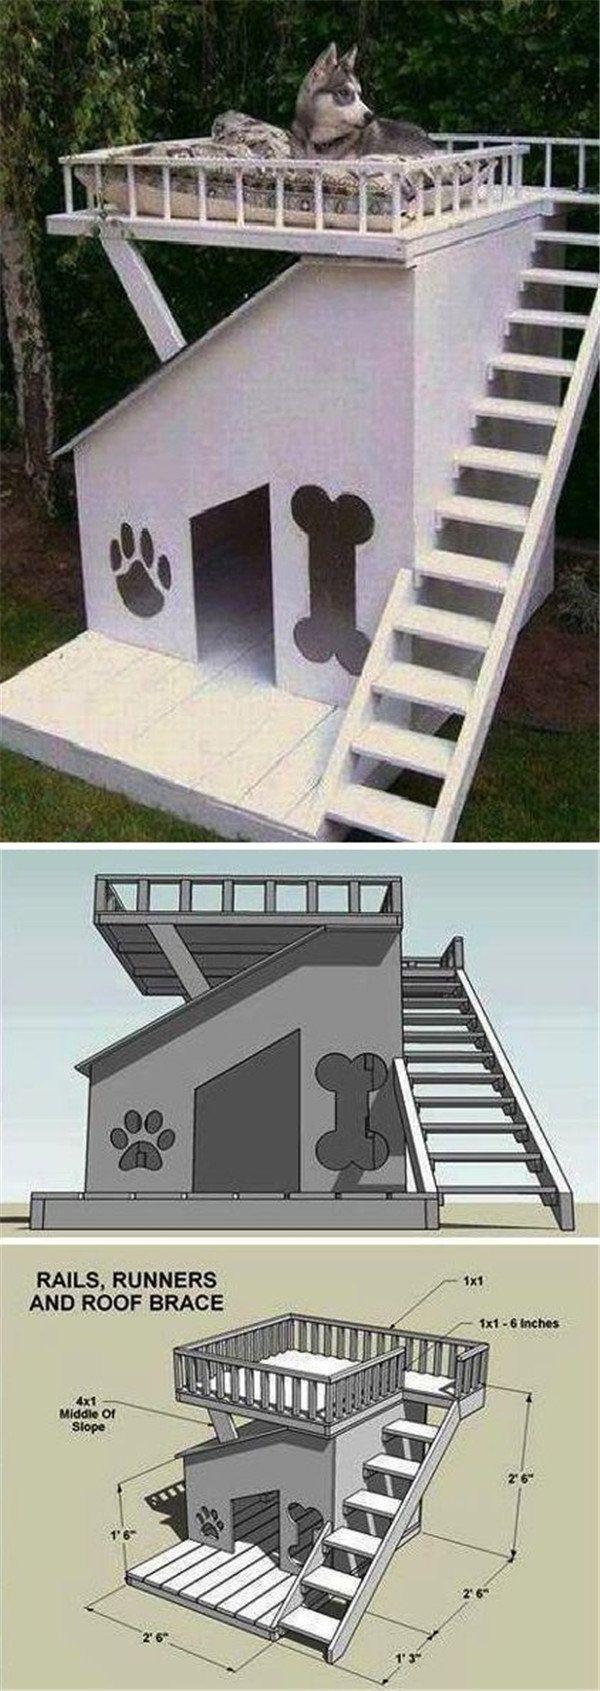 10 Diy Dog Houses So Amazing You Ll Wish You Lived In Them Knockoffdecor Com Dog House Diy Dog Houses Diy Stuffed Animals